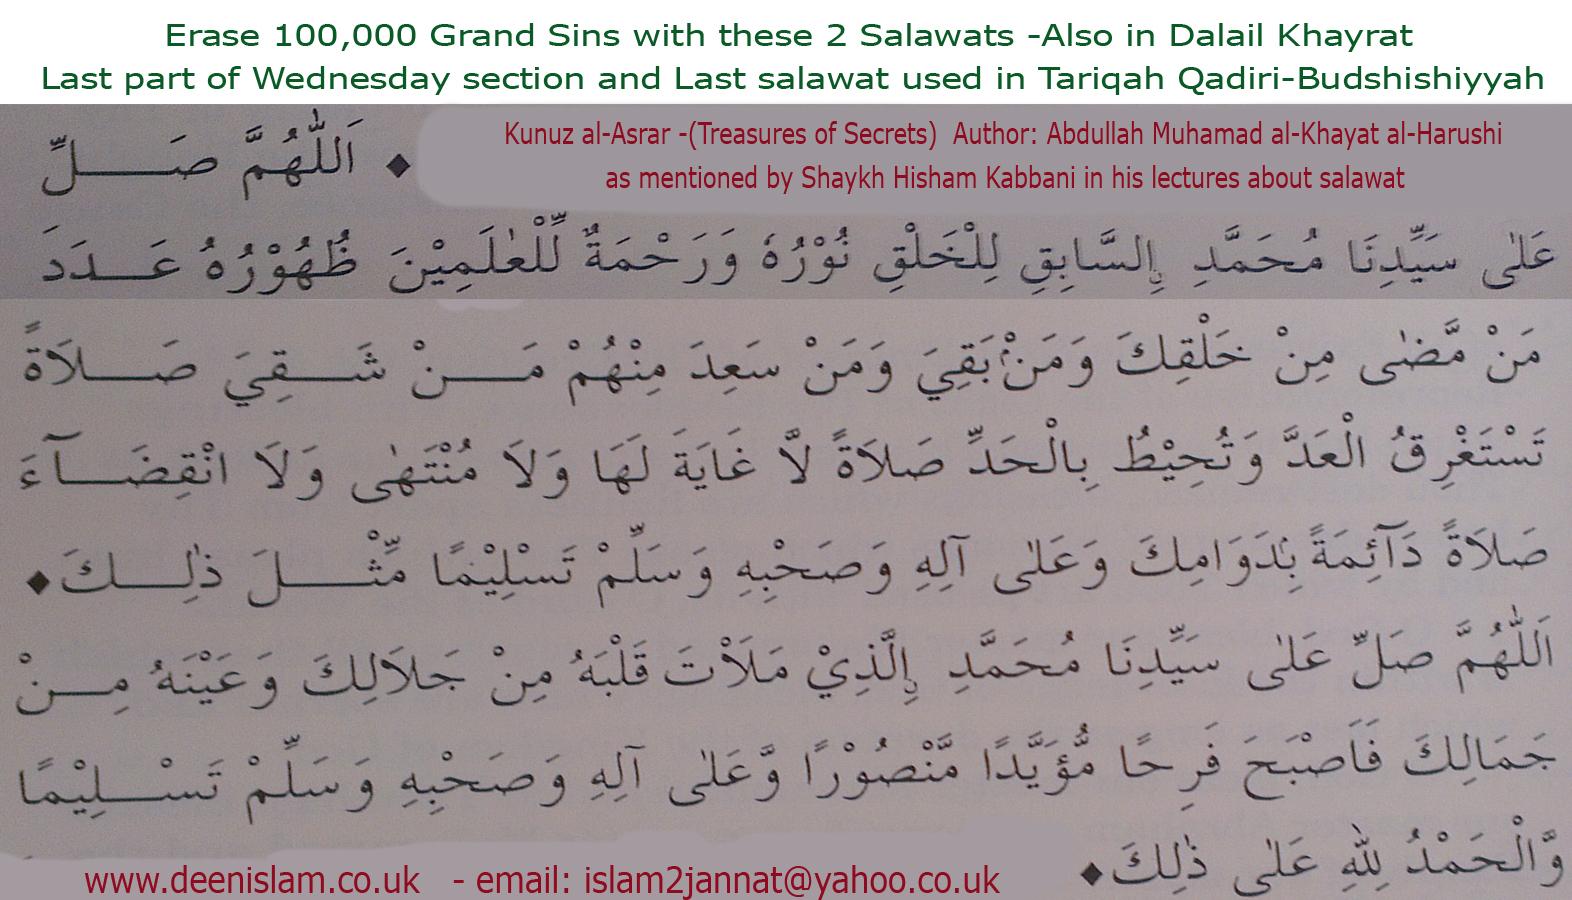 Deen islam - Erase 100,000 Grand Sins with these 2 Salawats